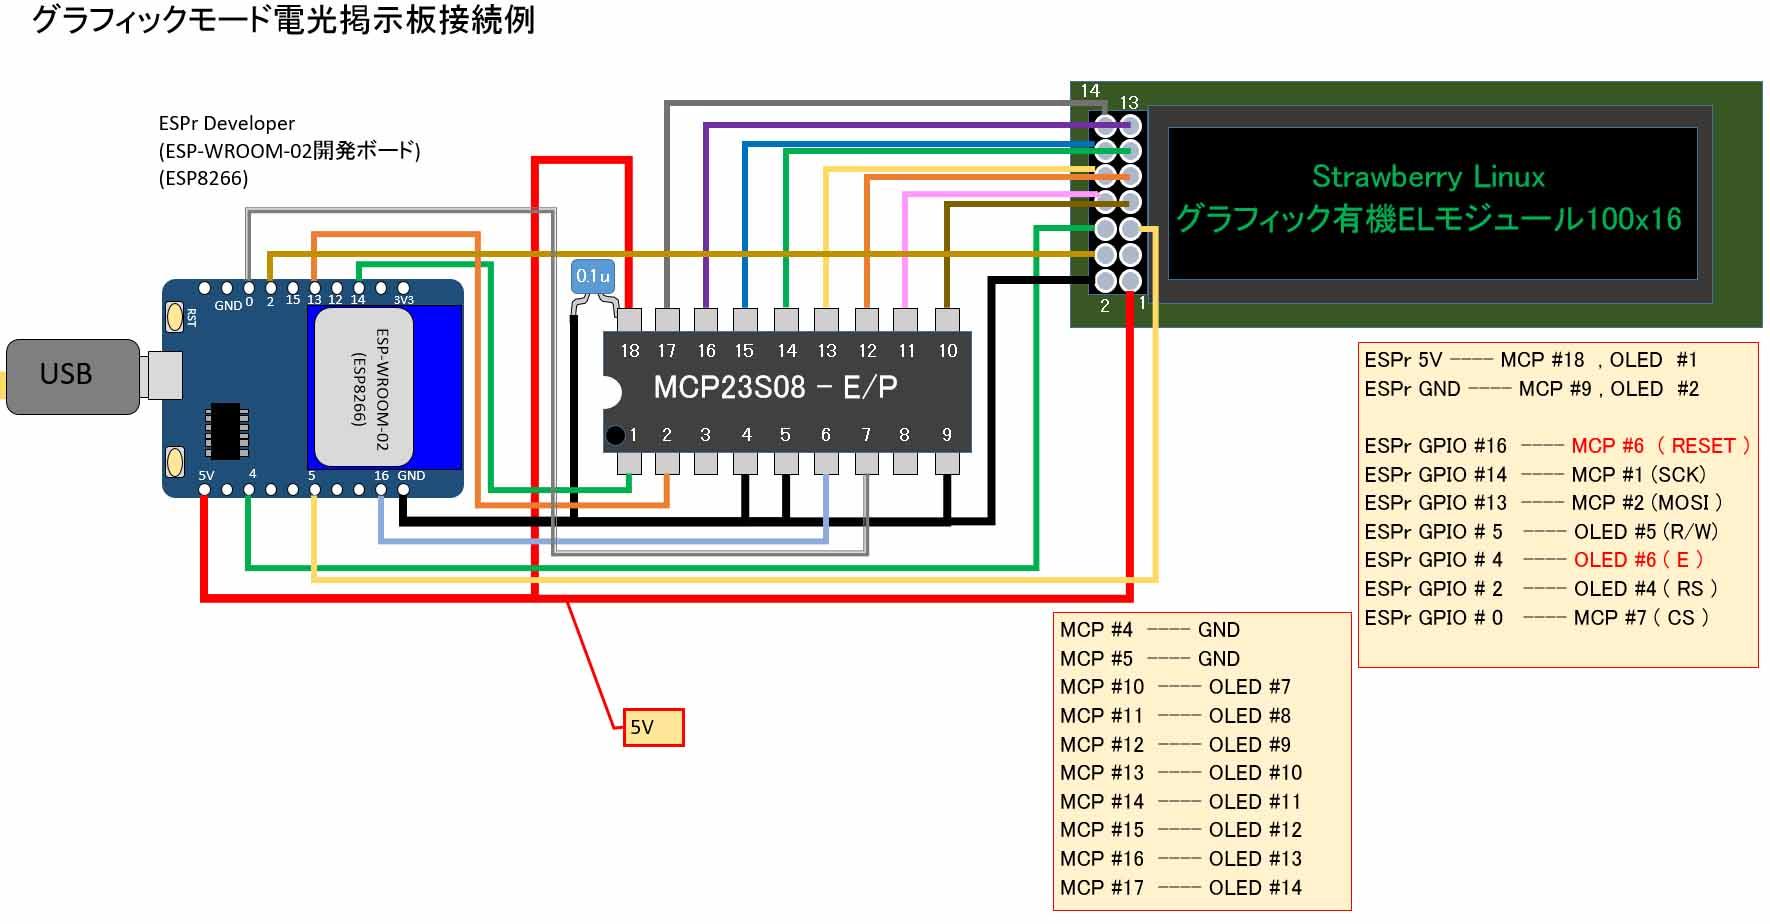 mcp_message01.jpg